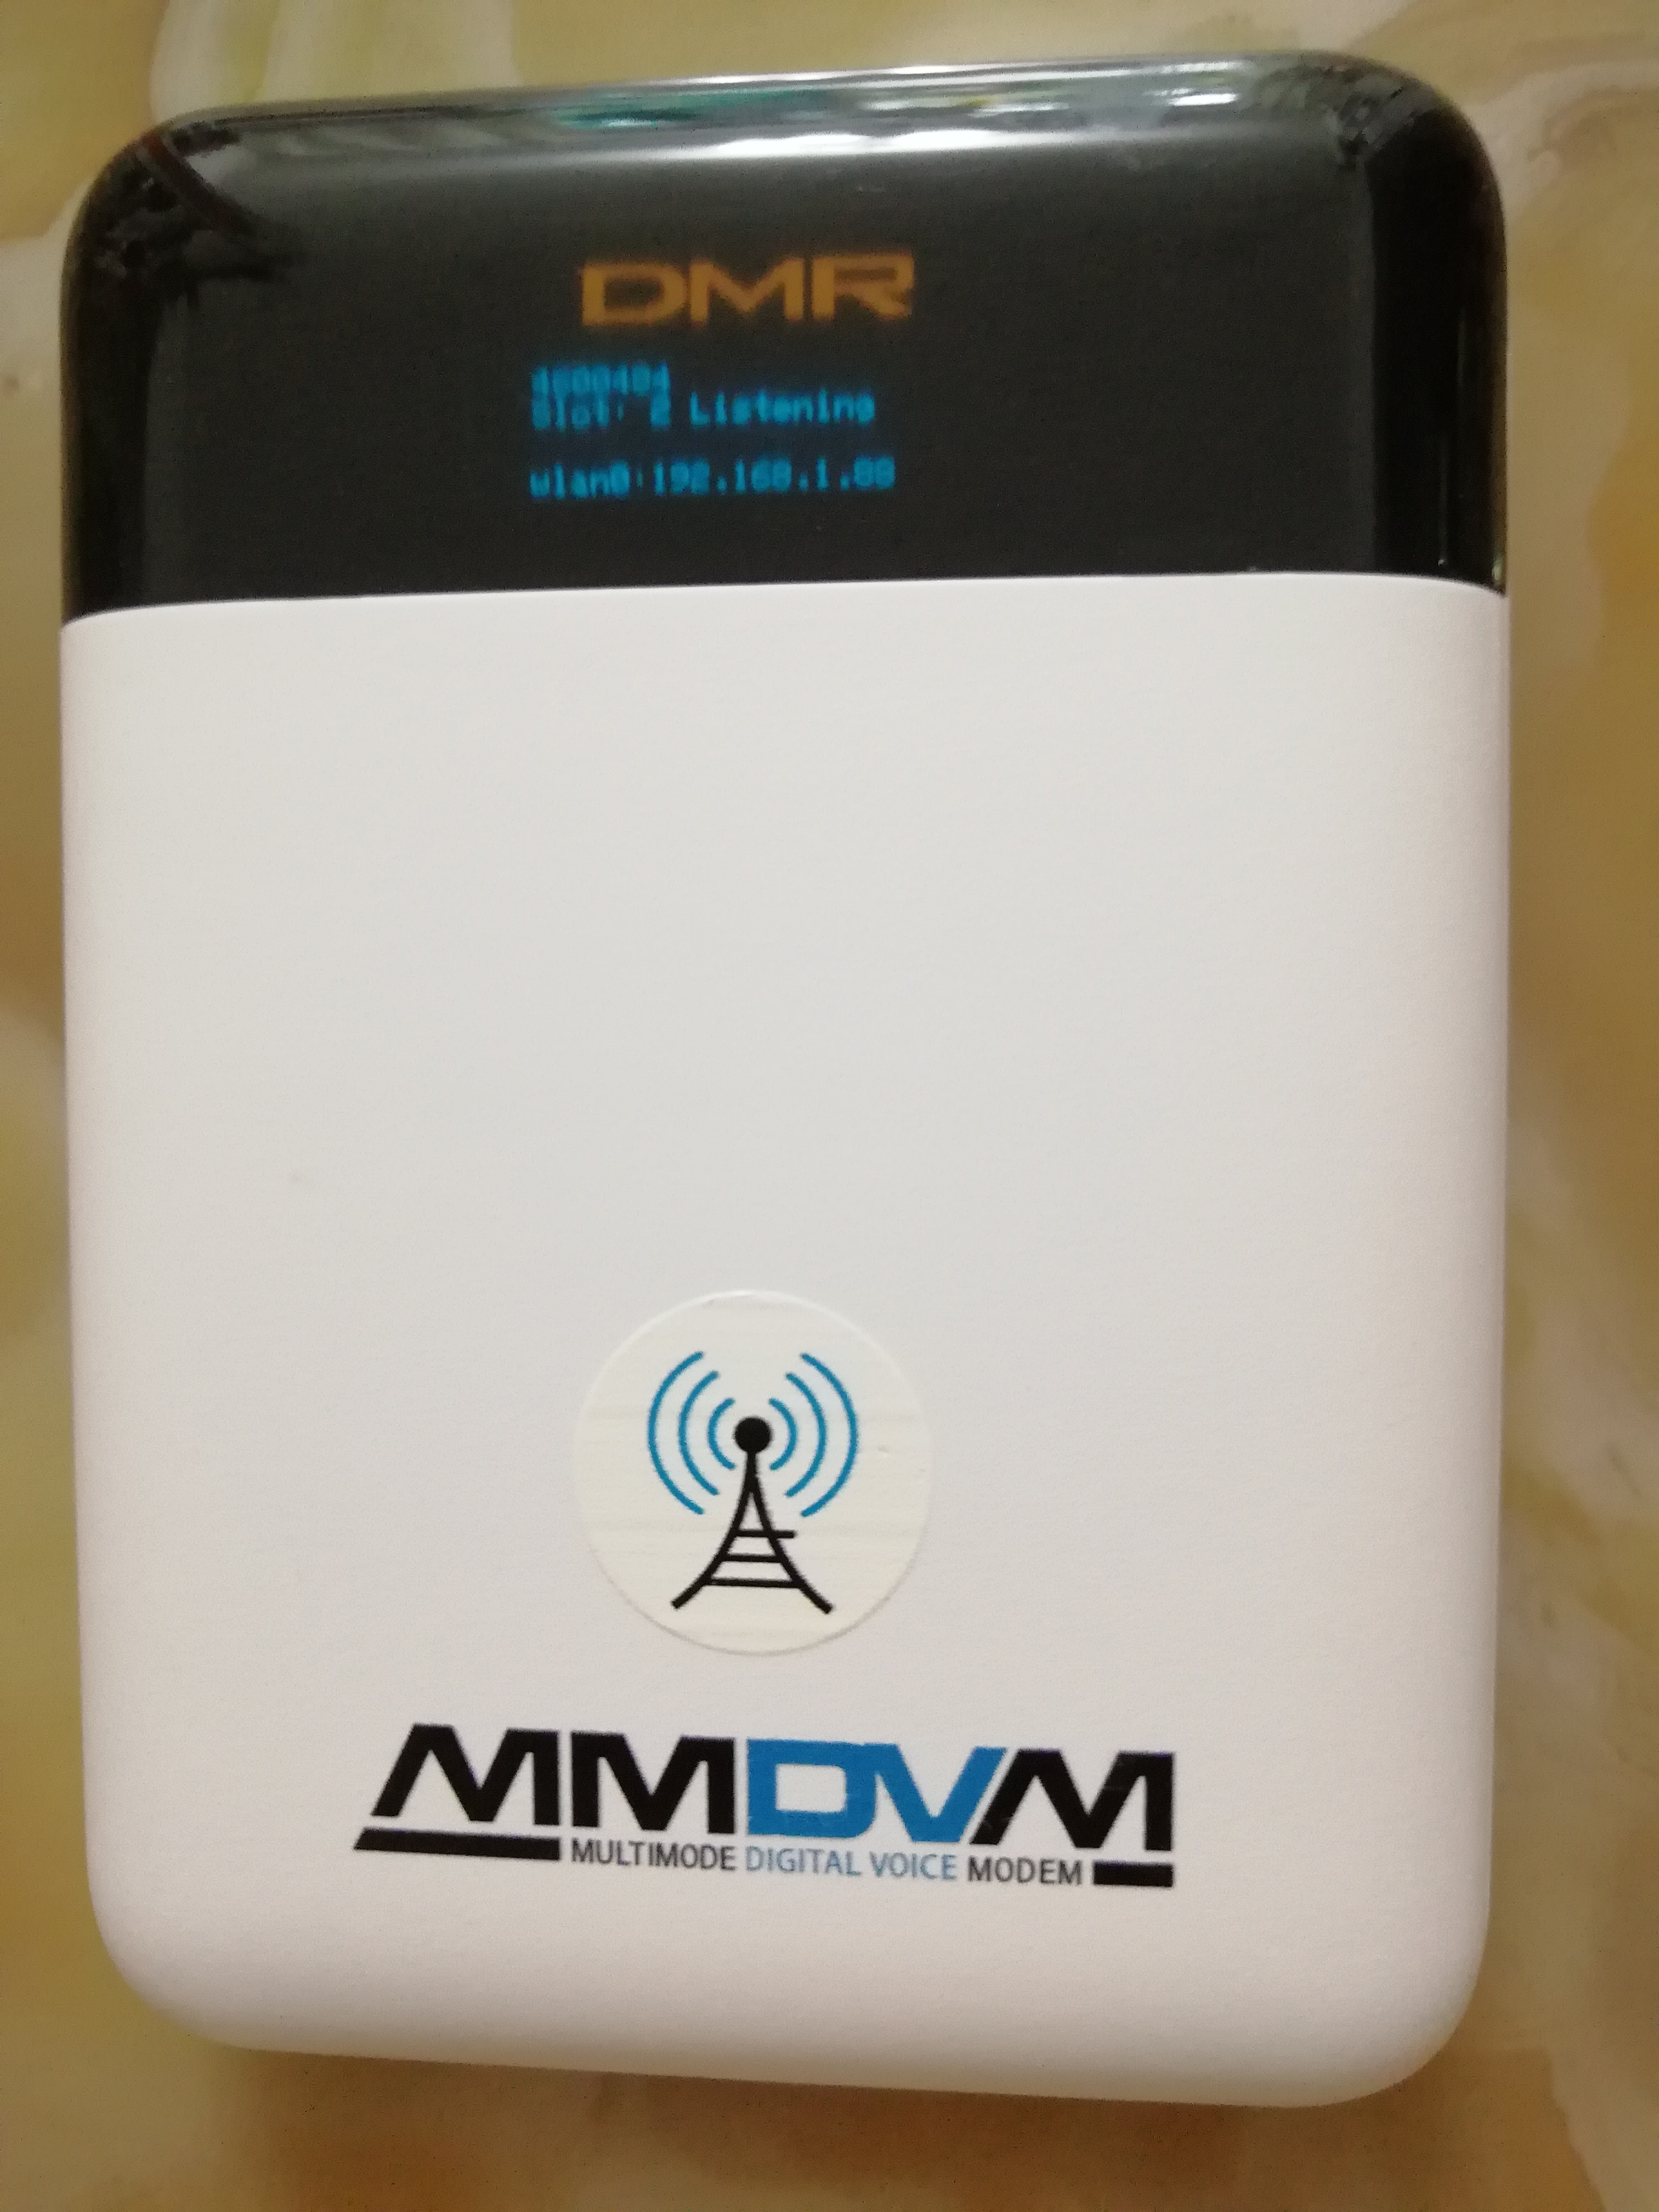 OLED Simplex Portable HotSPOT MMDVM(built-in Battery)DMR/YSF/P25/NXDN/DSTAR